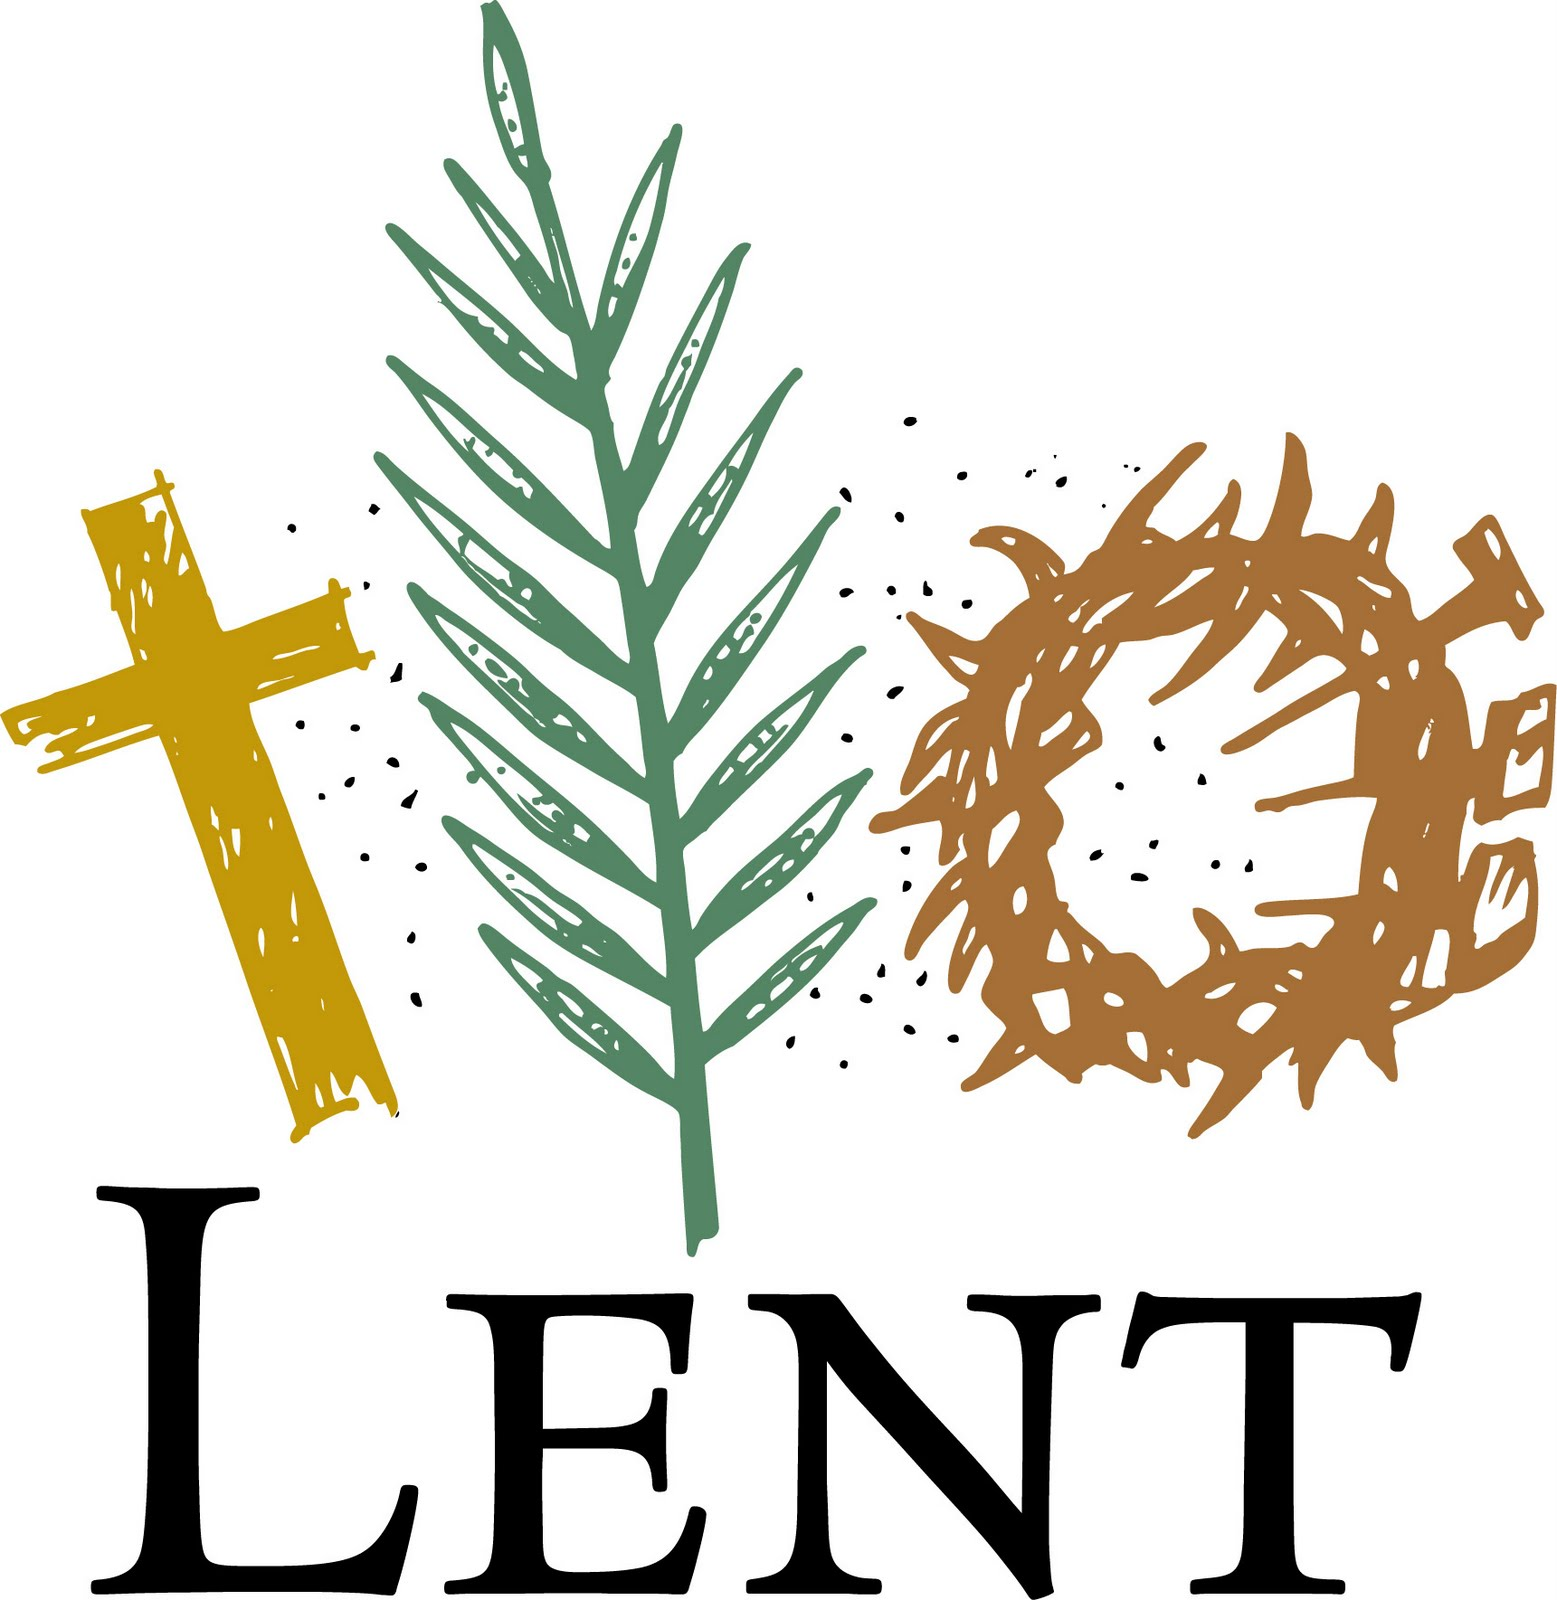 Lent Clip Art Free